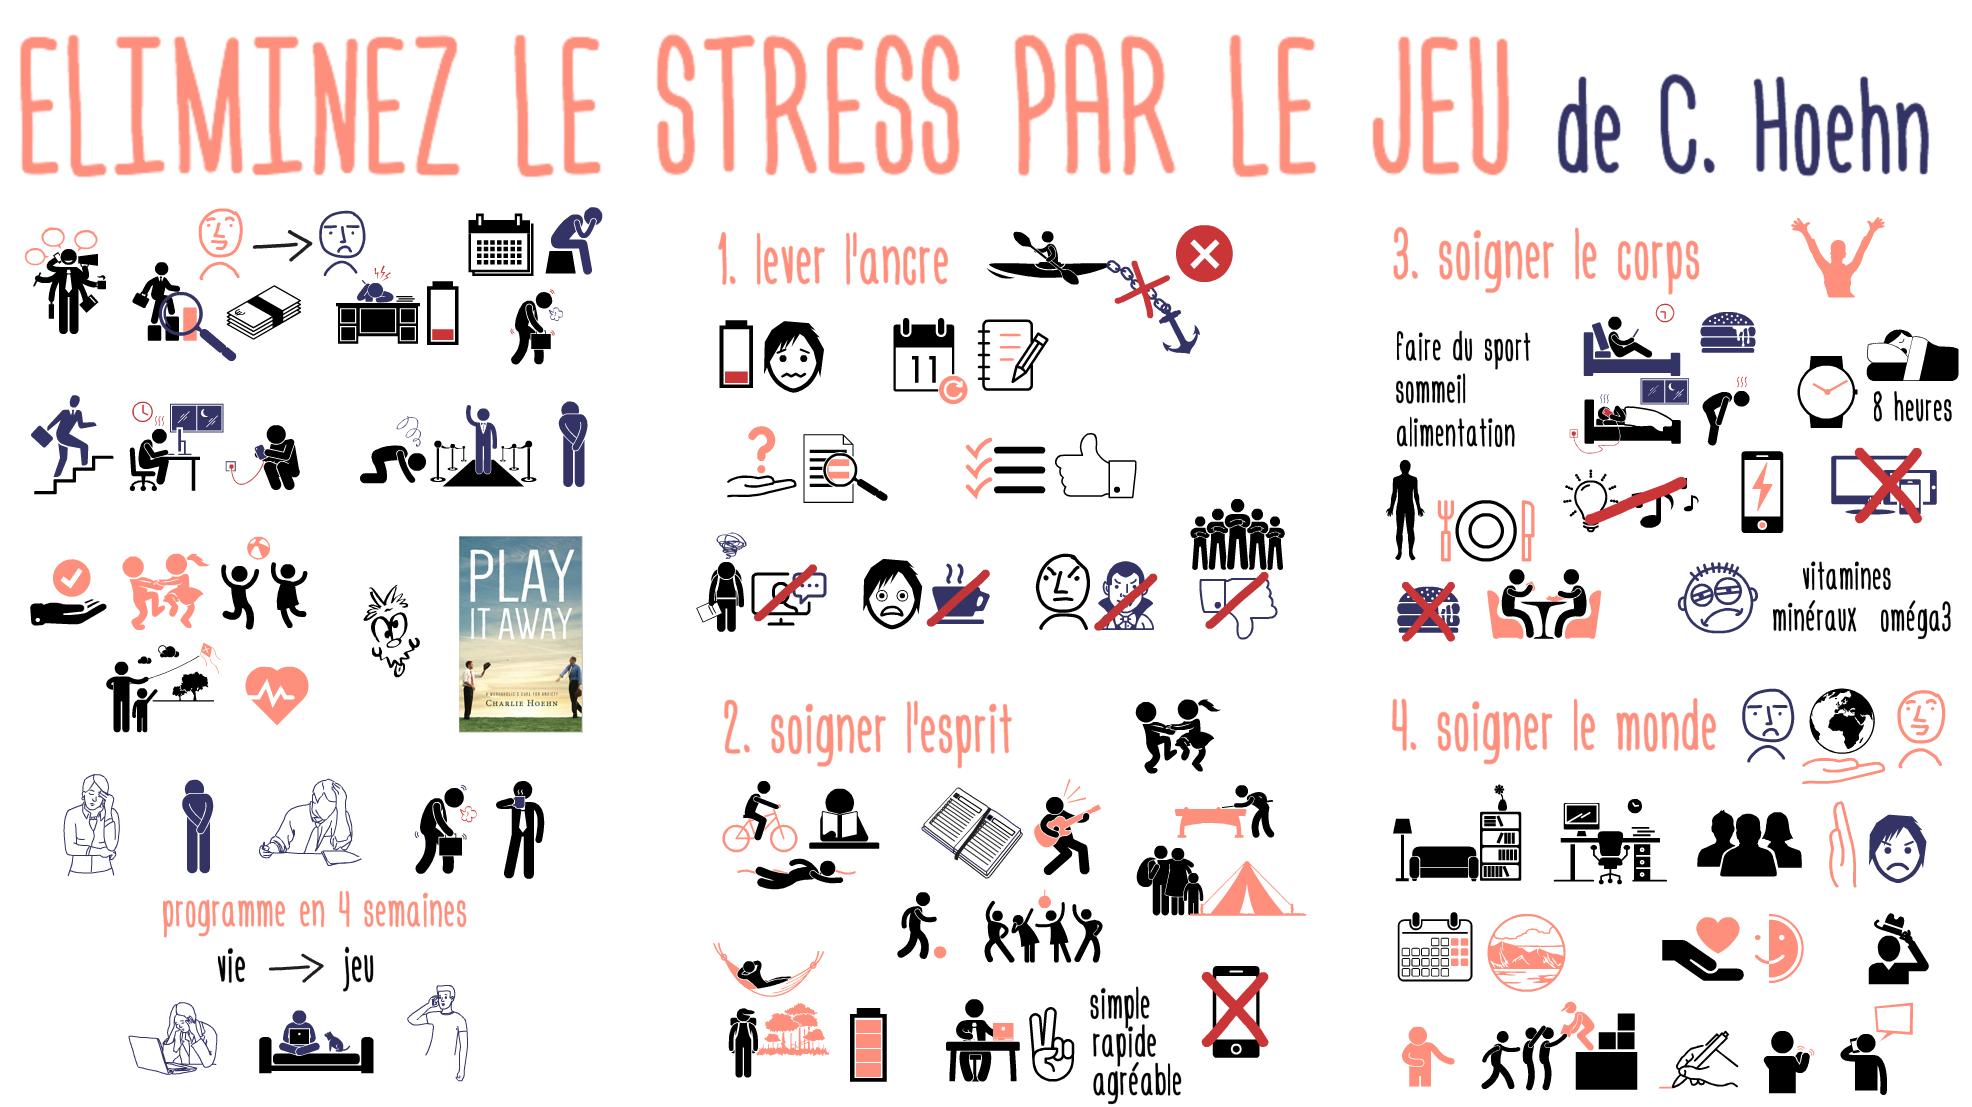 Eliminez stress Jeu